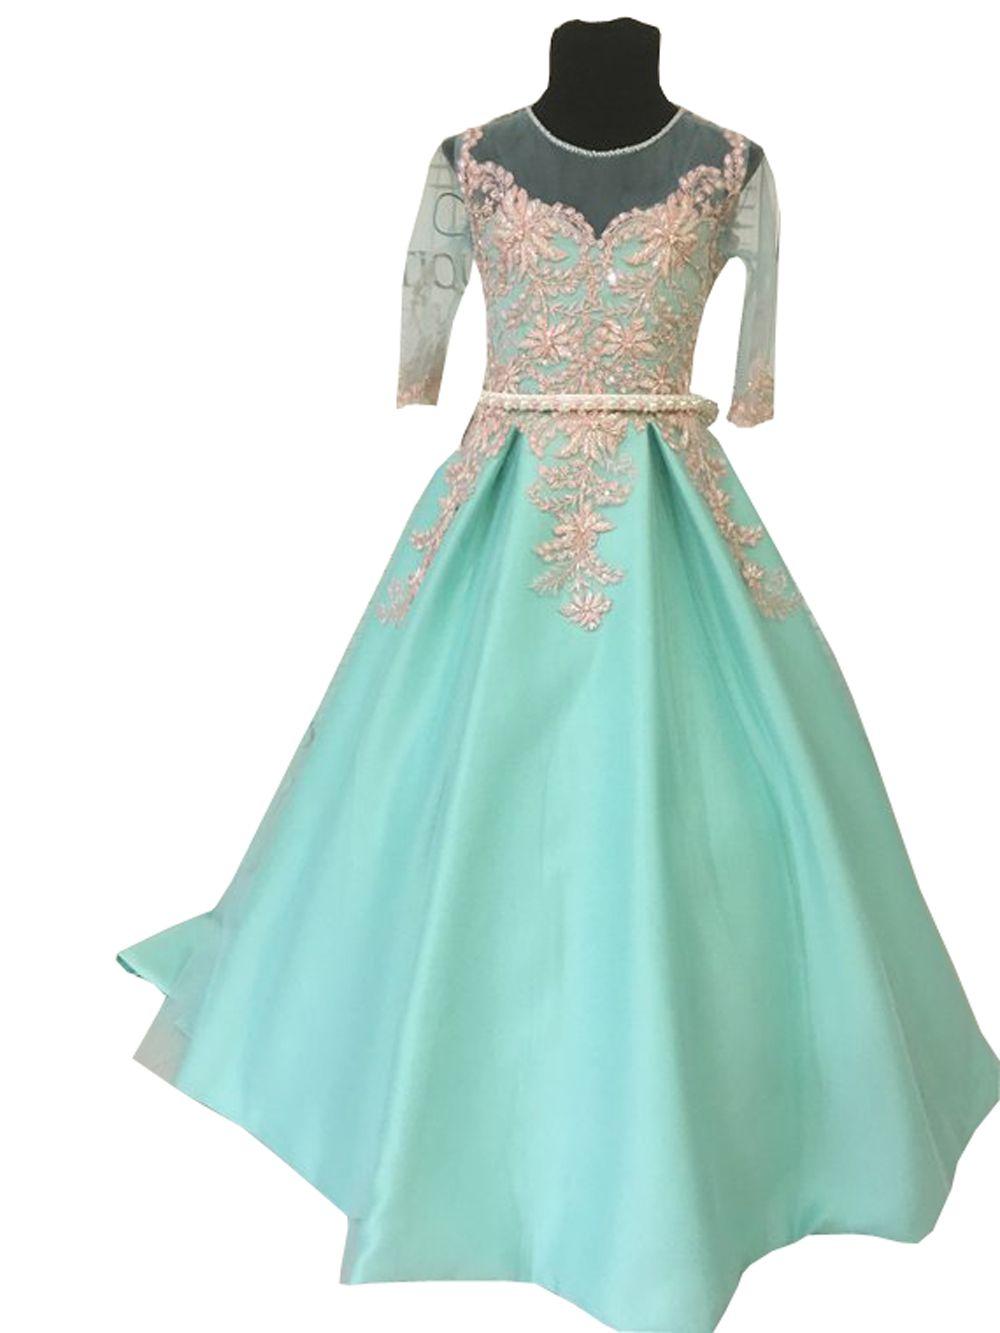 Mint Green Flower Girl Dresses 2019 Gold Applique Beaded Sheer Neckline 1/2 Long Sleeve Toddler Pageant Dresses First Communion Dress